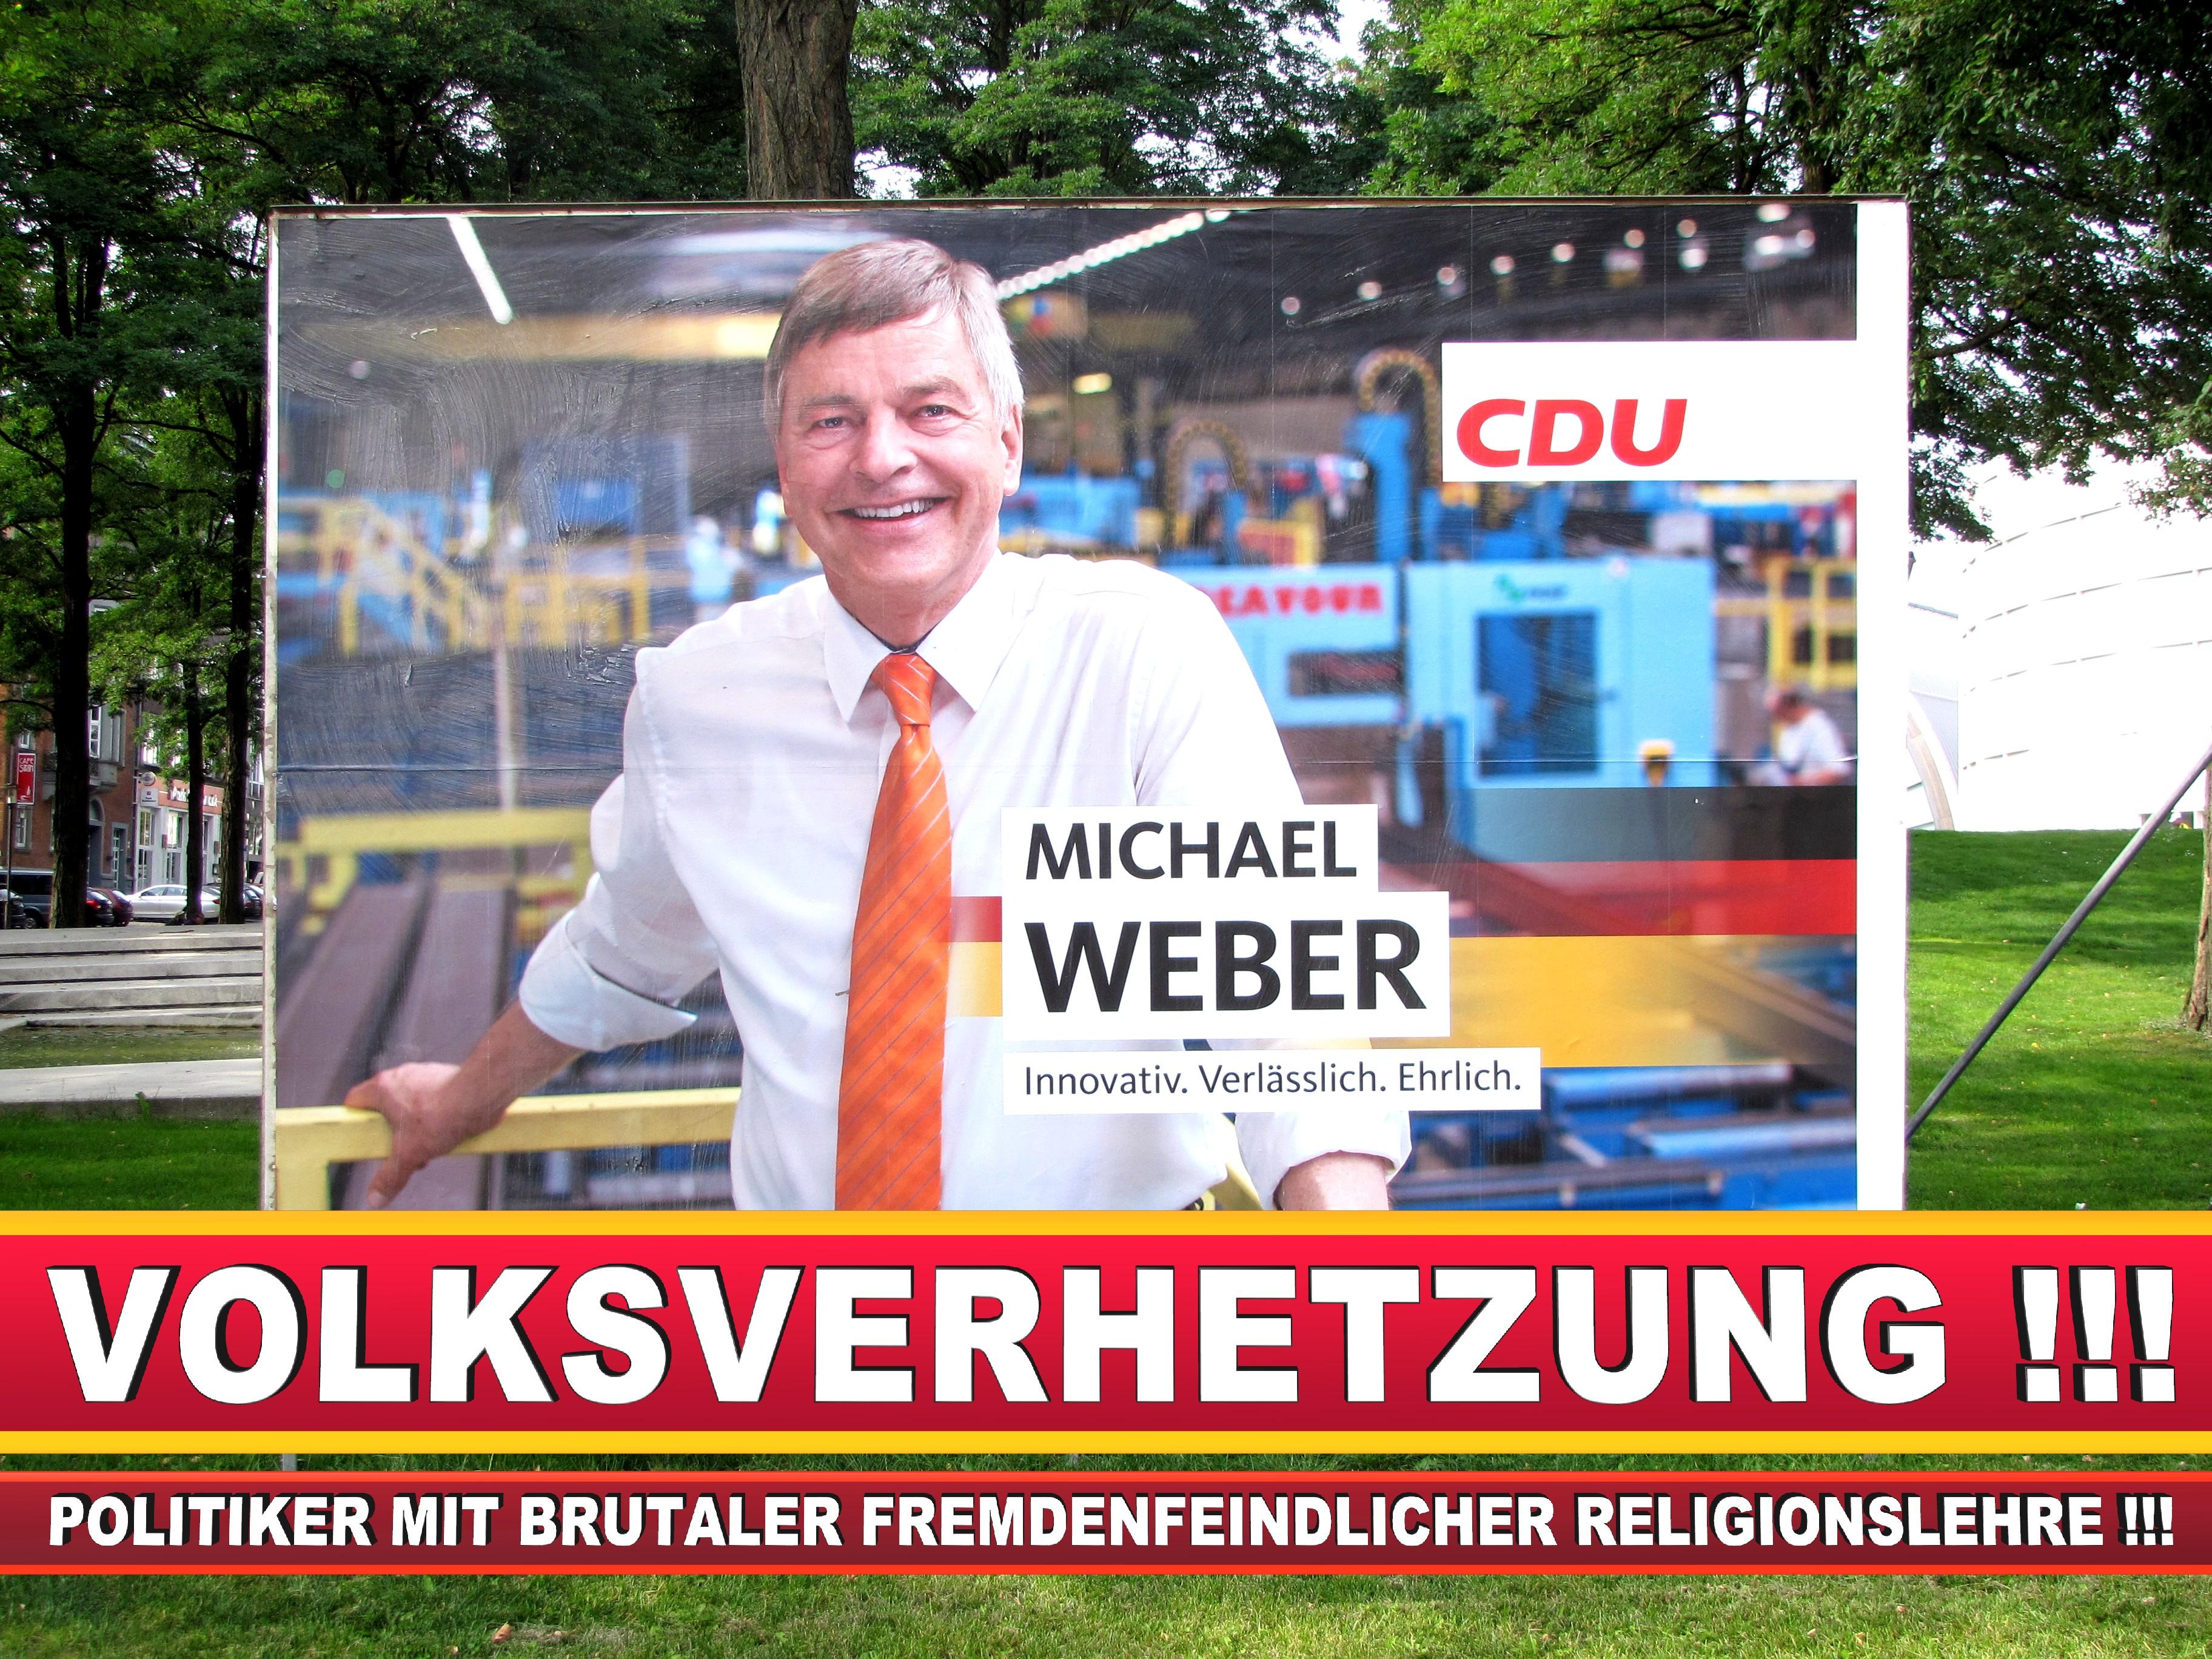 Michael Weber CDU Bielefeld Volksverhetzung In Der Bibel Nachgewiesen (3)